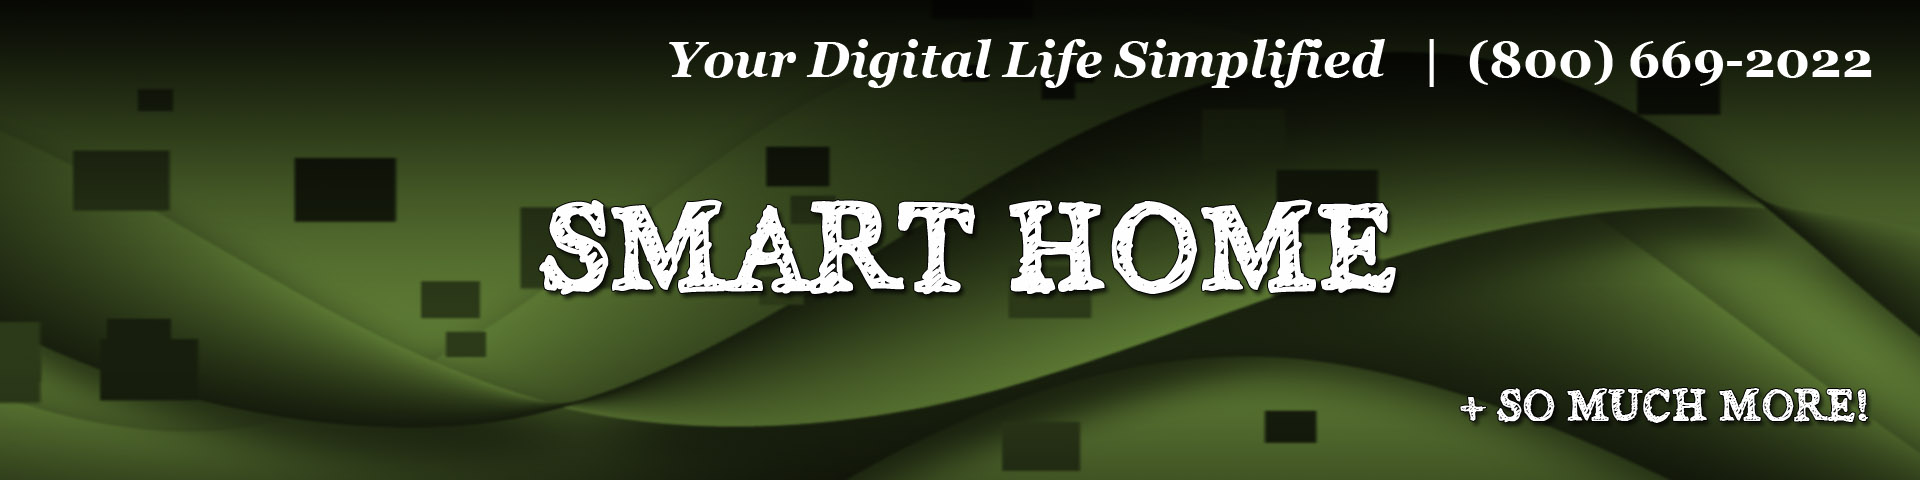 Smart Home Banner